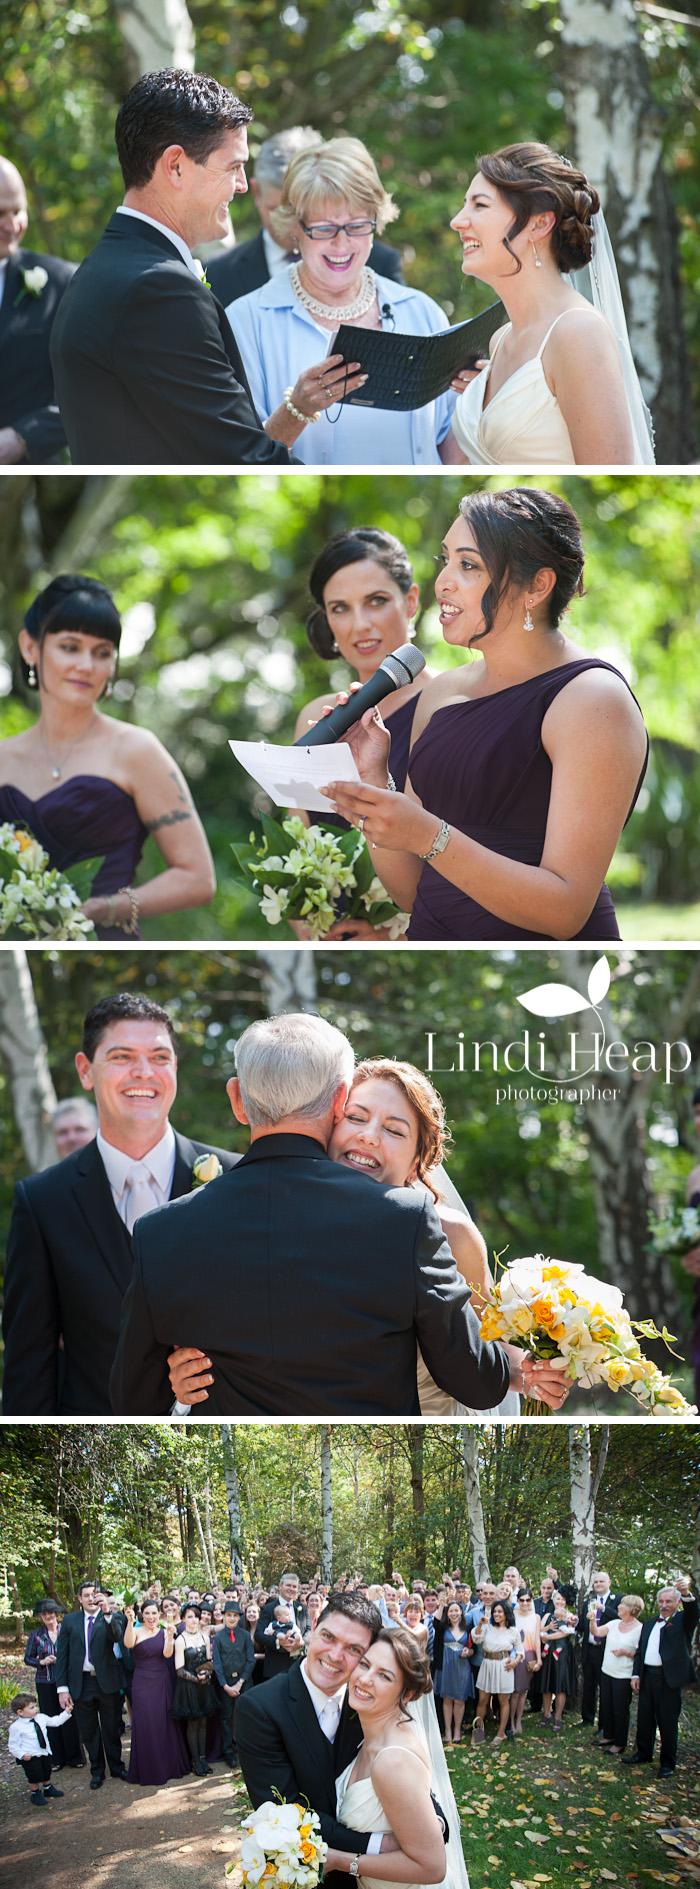 Autumn Wedding at Yarralumla Gallery by Lindi Heap Photography, Canberra, Australia, Canberra Wedding Photographer